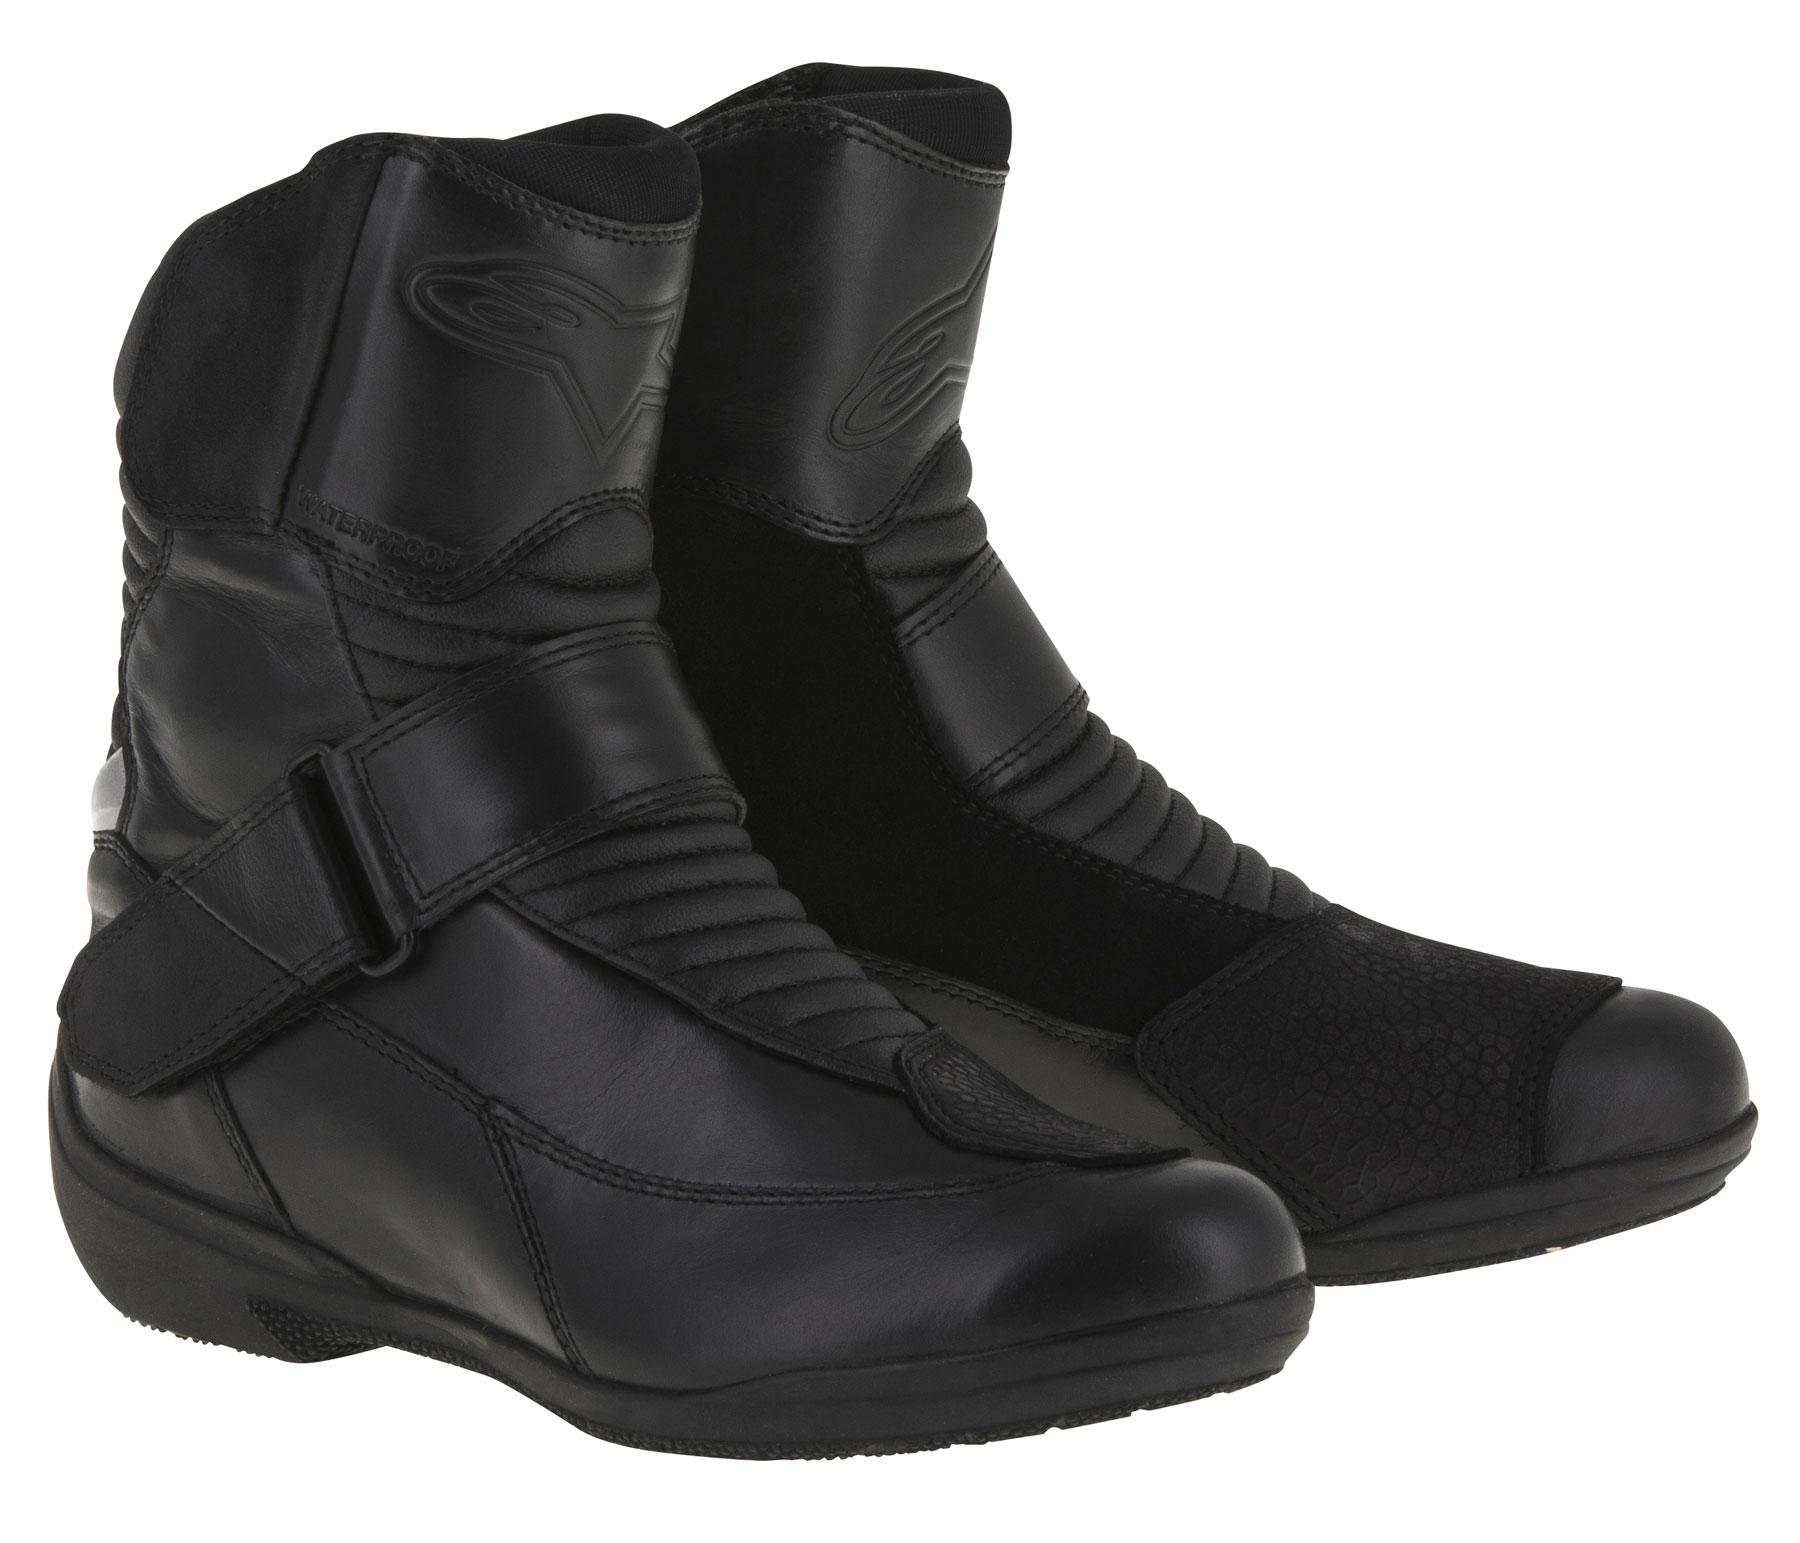 Alpinestars Stella VALENCIA Waterproof Leather Touring Boots (Black)